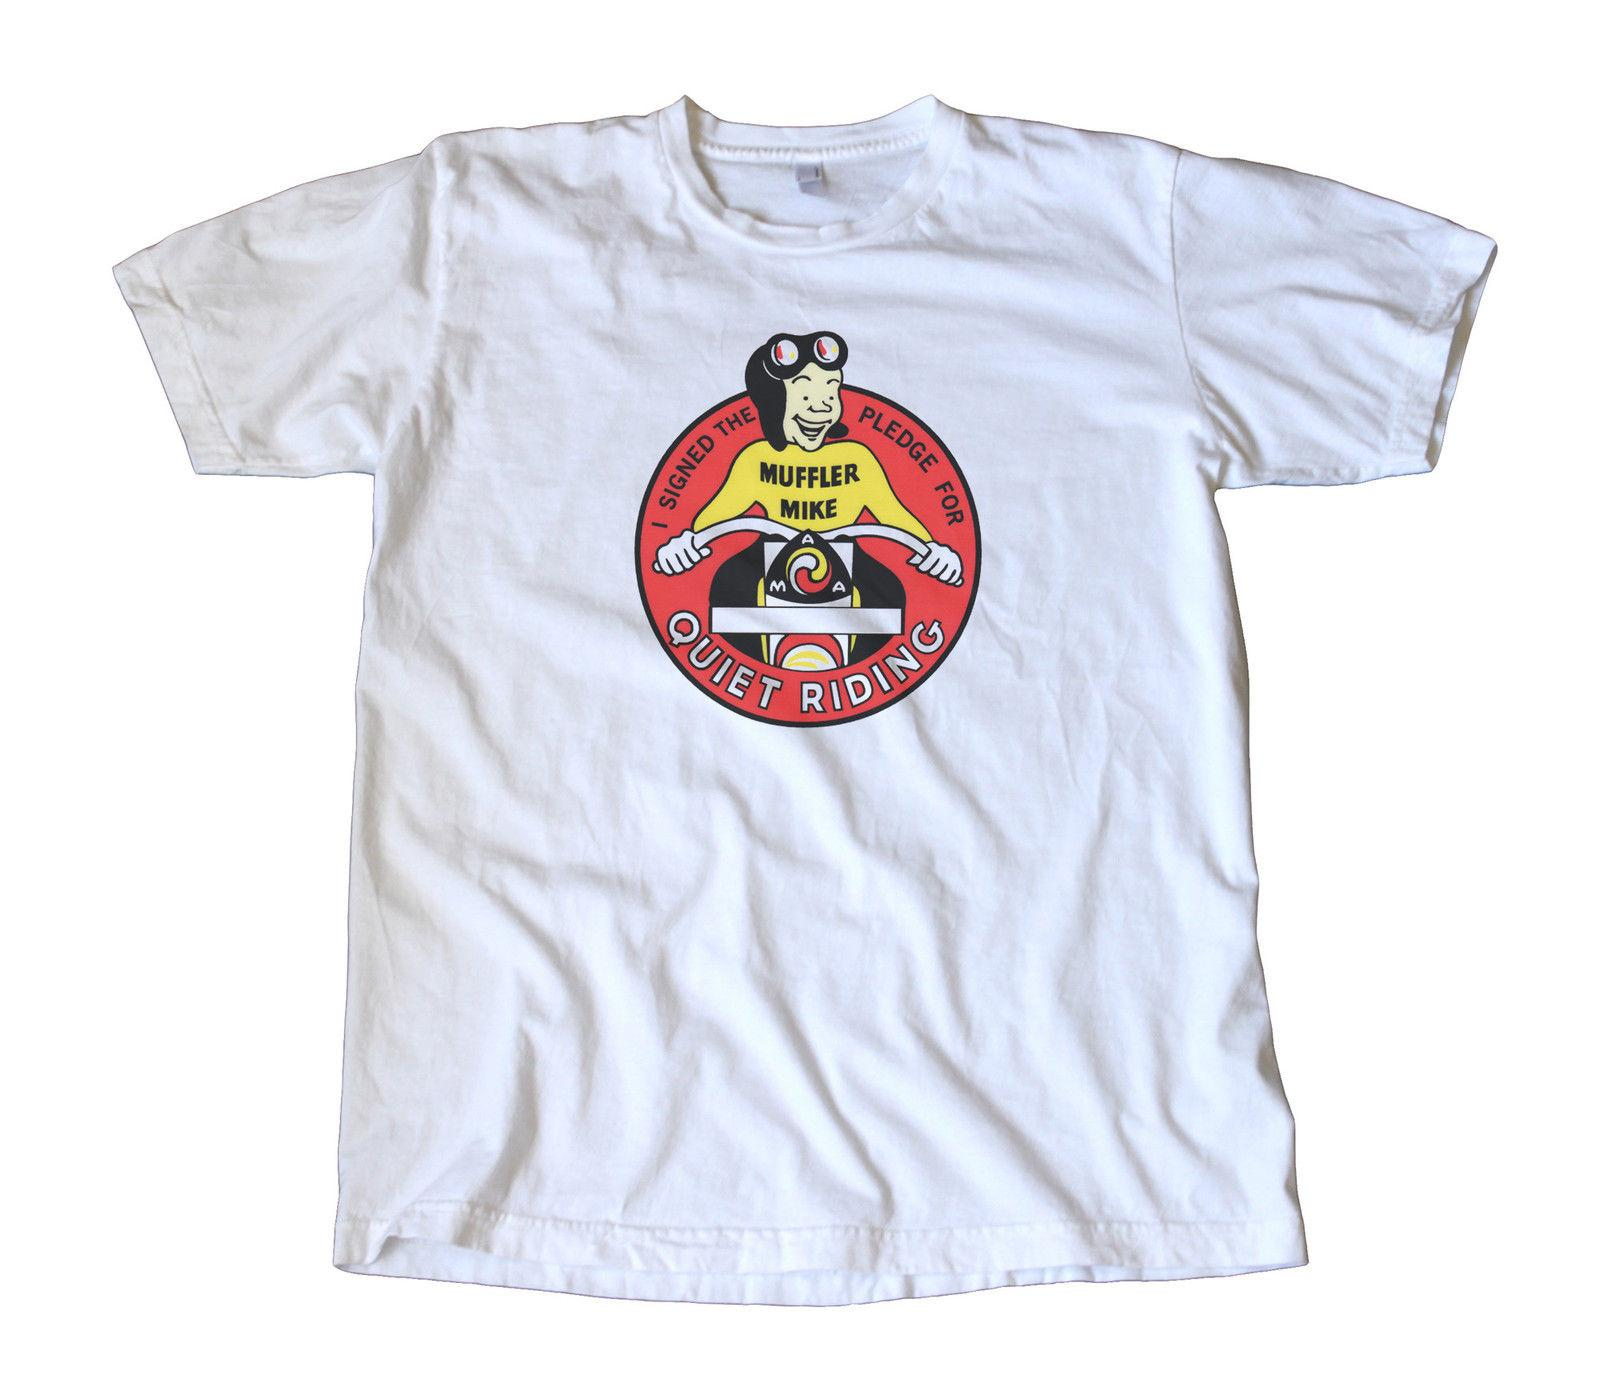 Grosshandel Vintage Muffler Mike Ruhig Reiten Aufkleber T Shirt